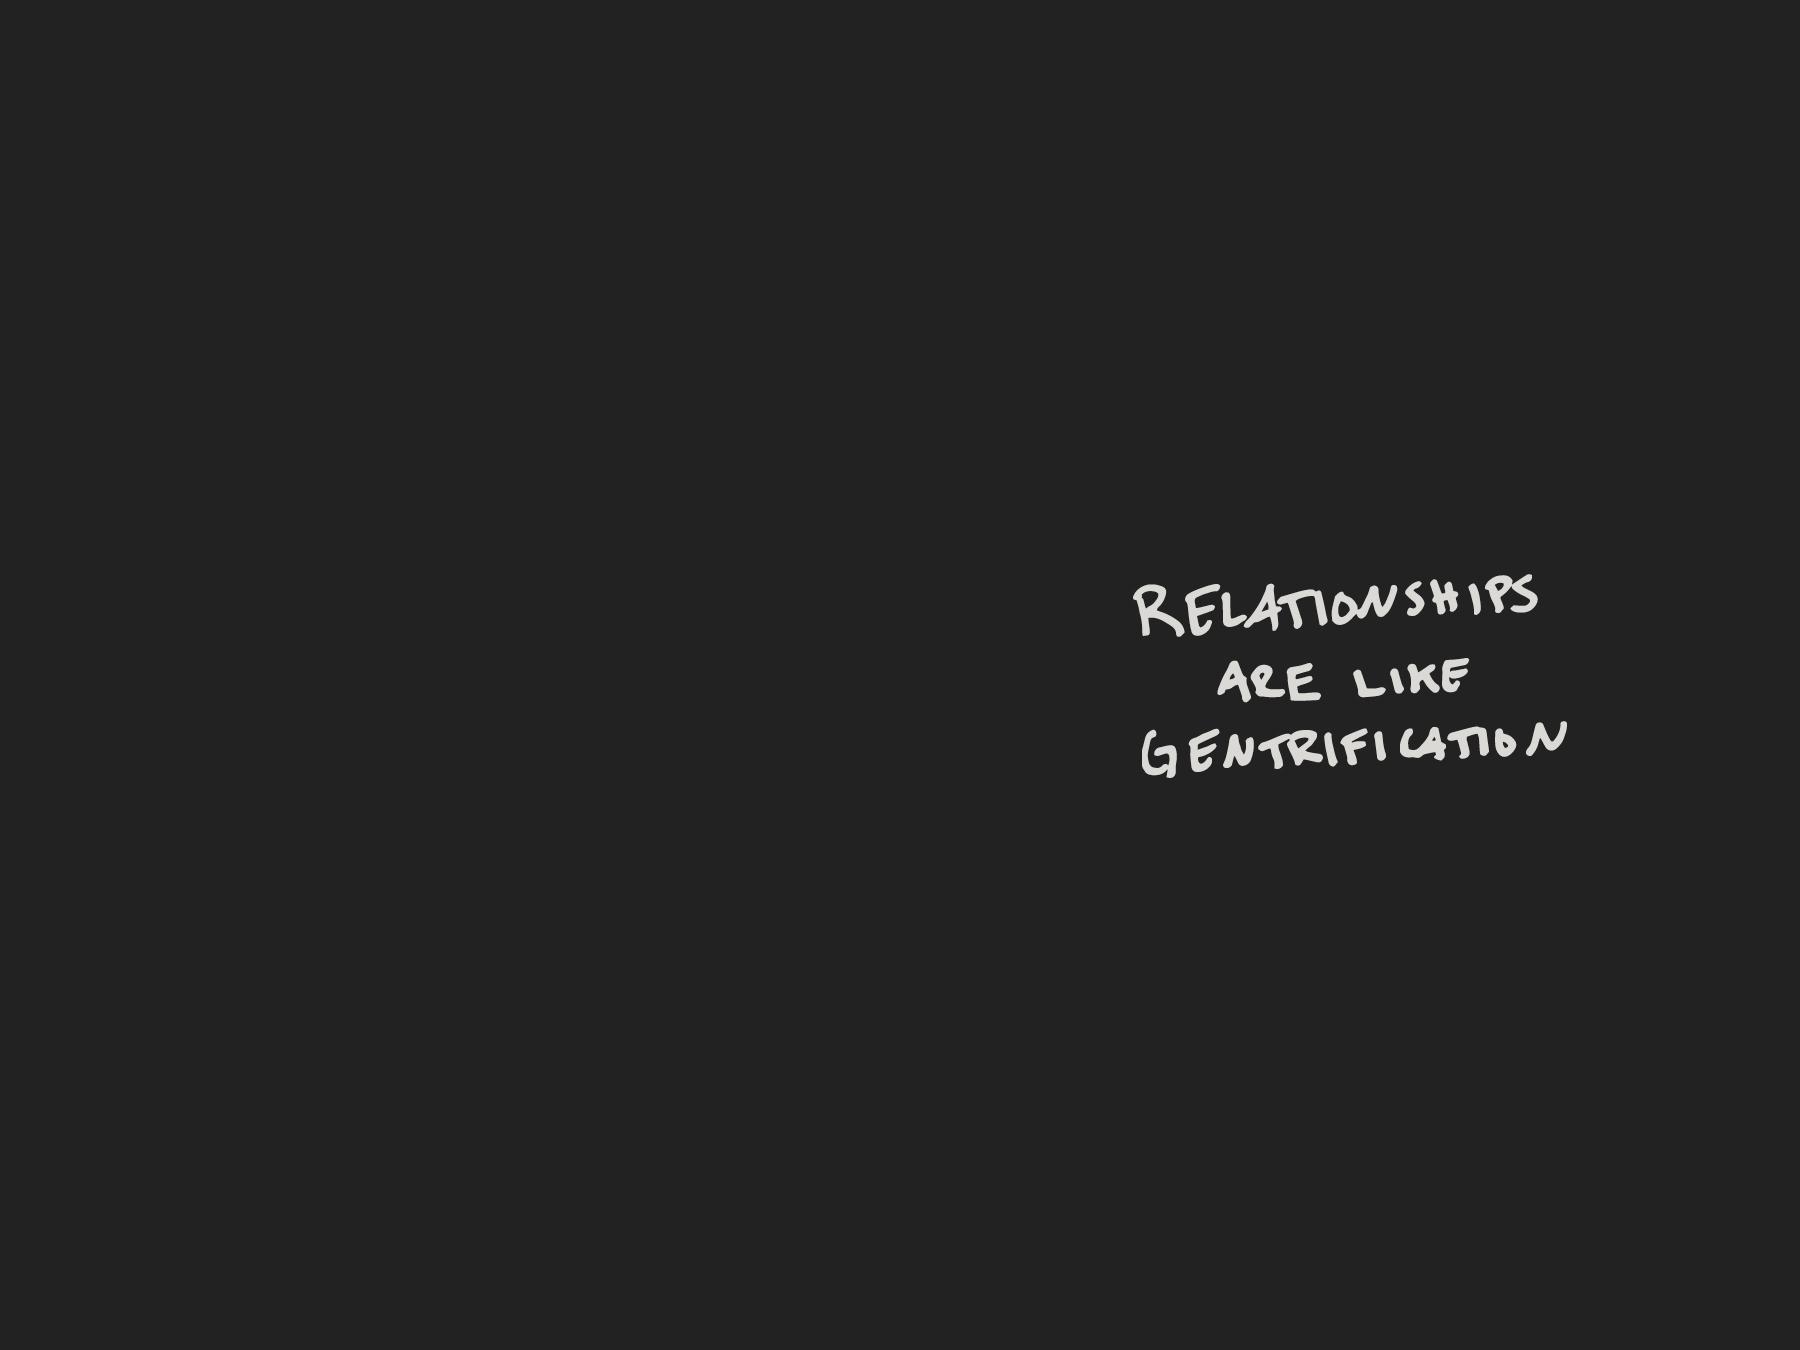 argiro_relationships_gentrification_finalweb2.jpg